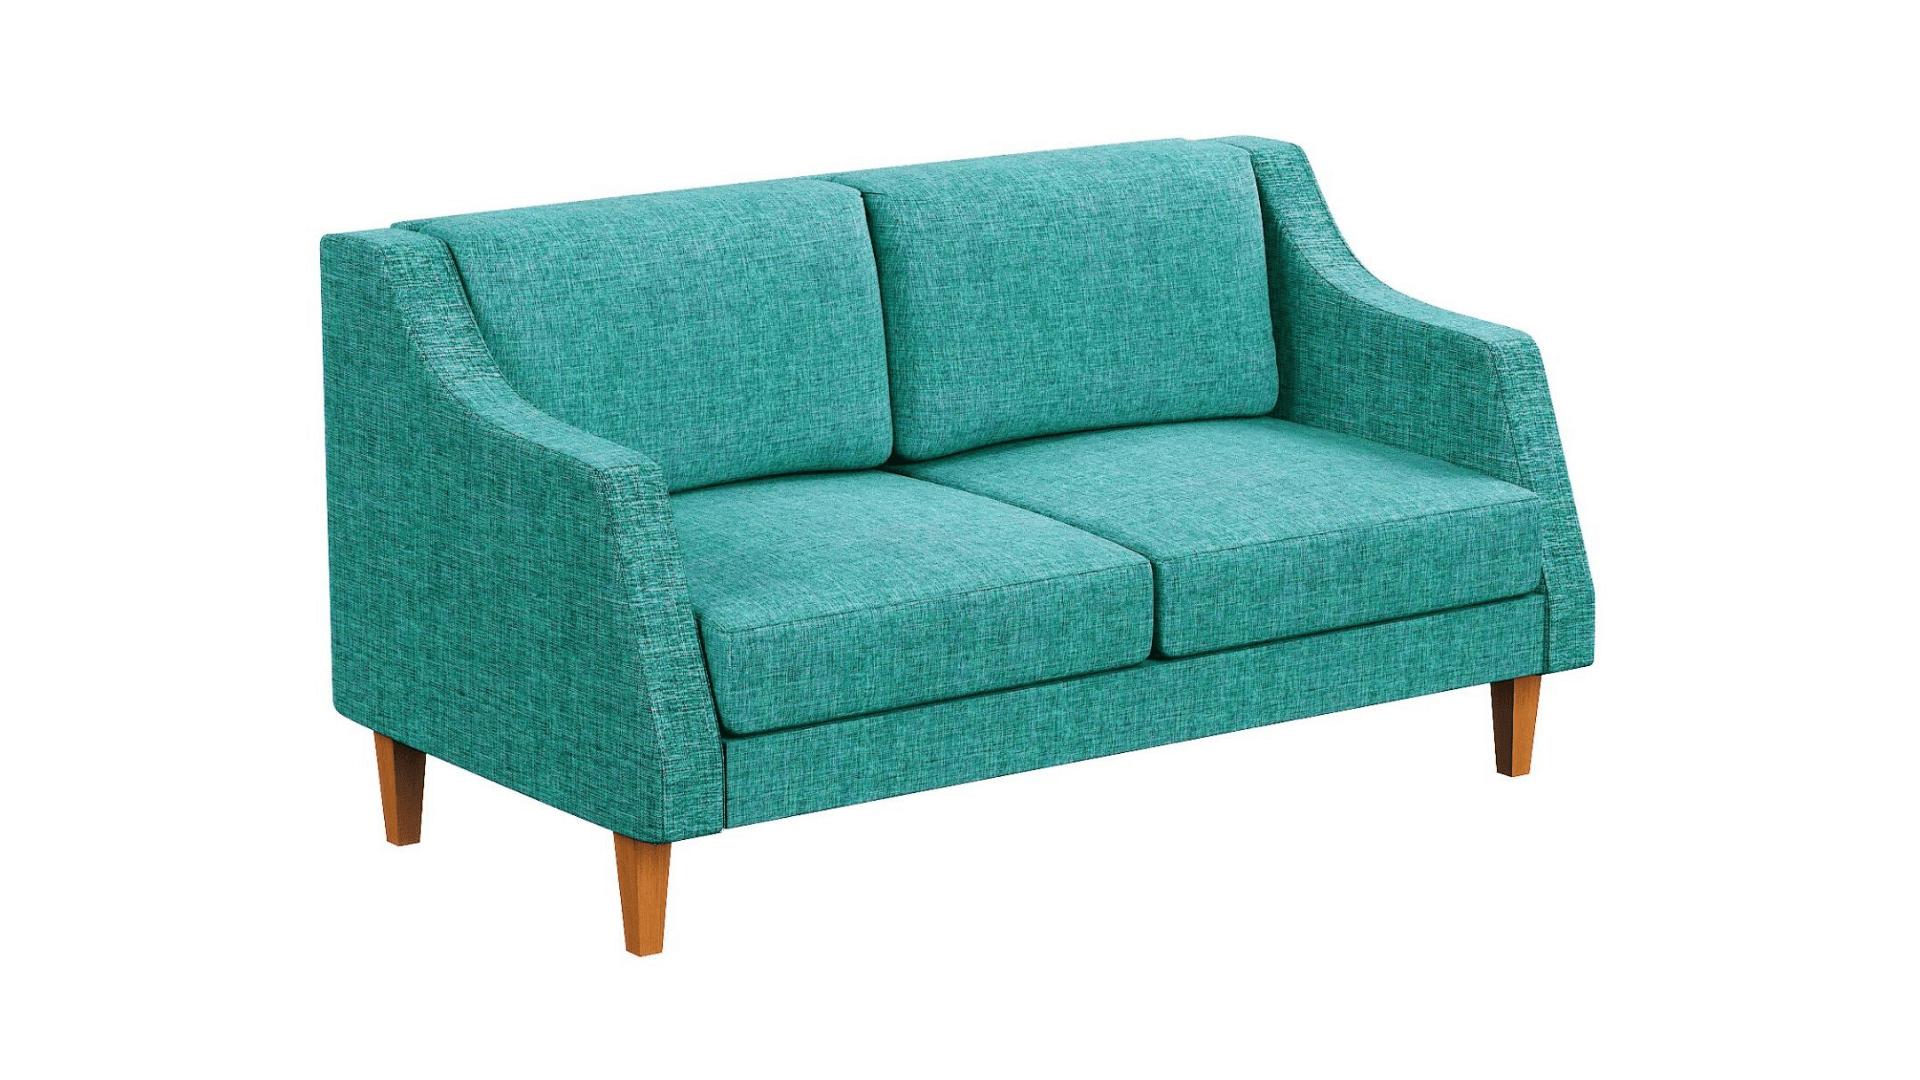 Jual Sofa Minimalis di Mamberamo Tengah